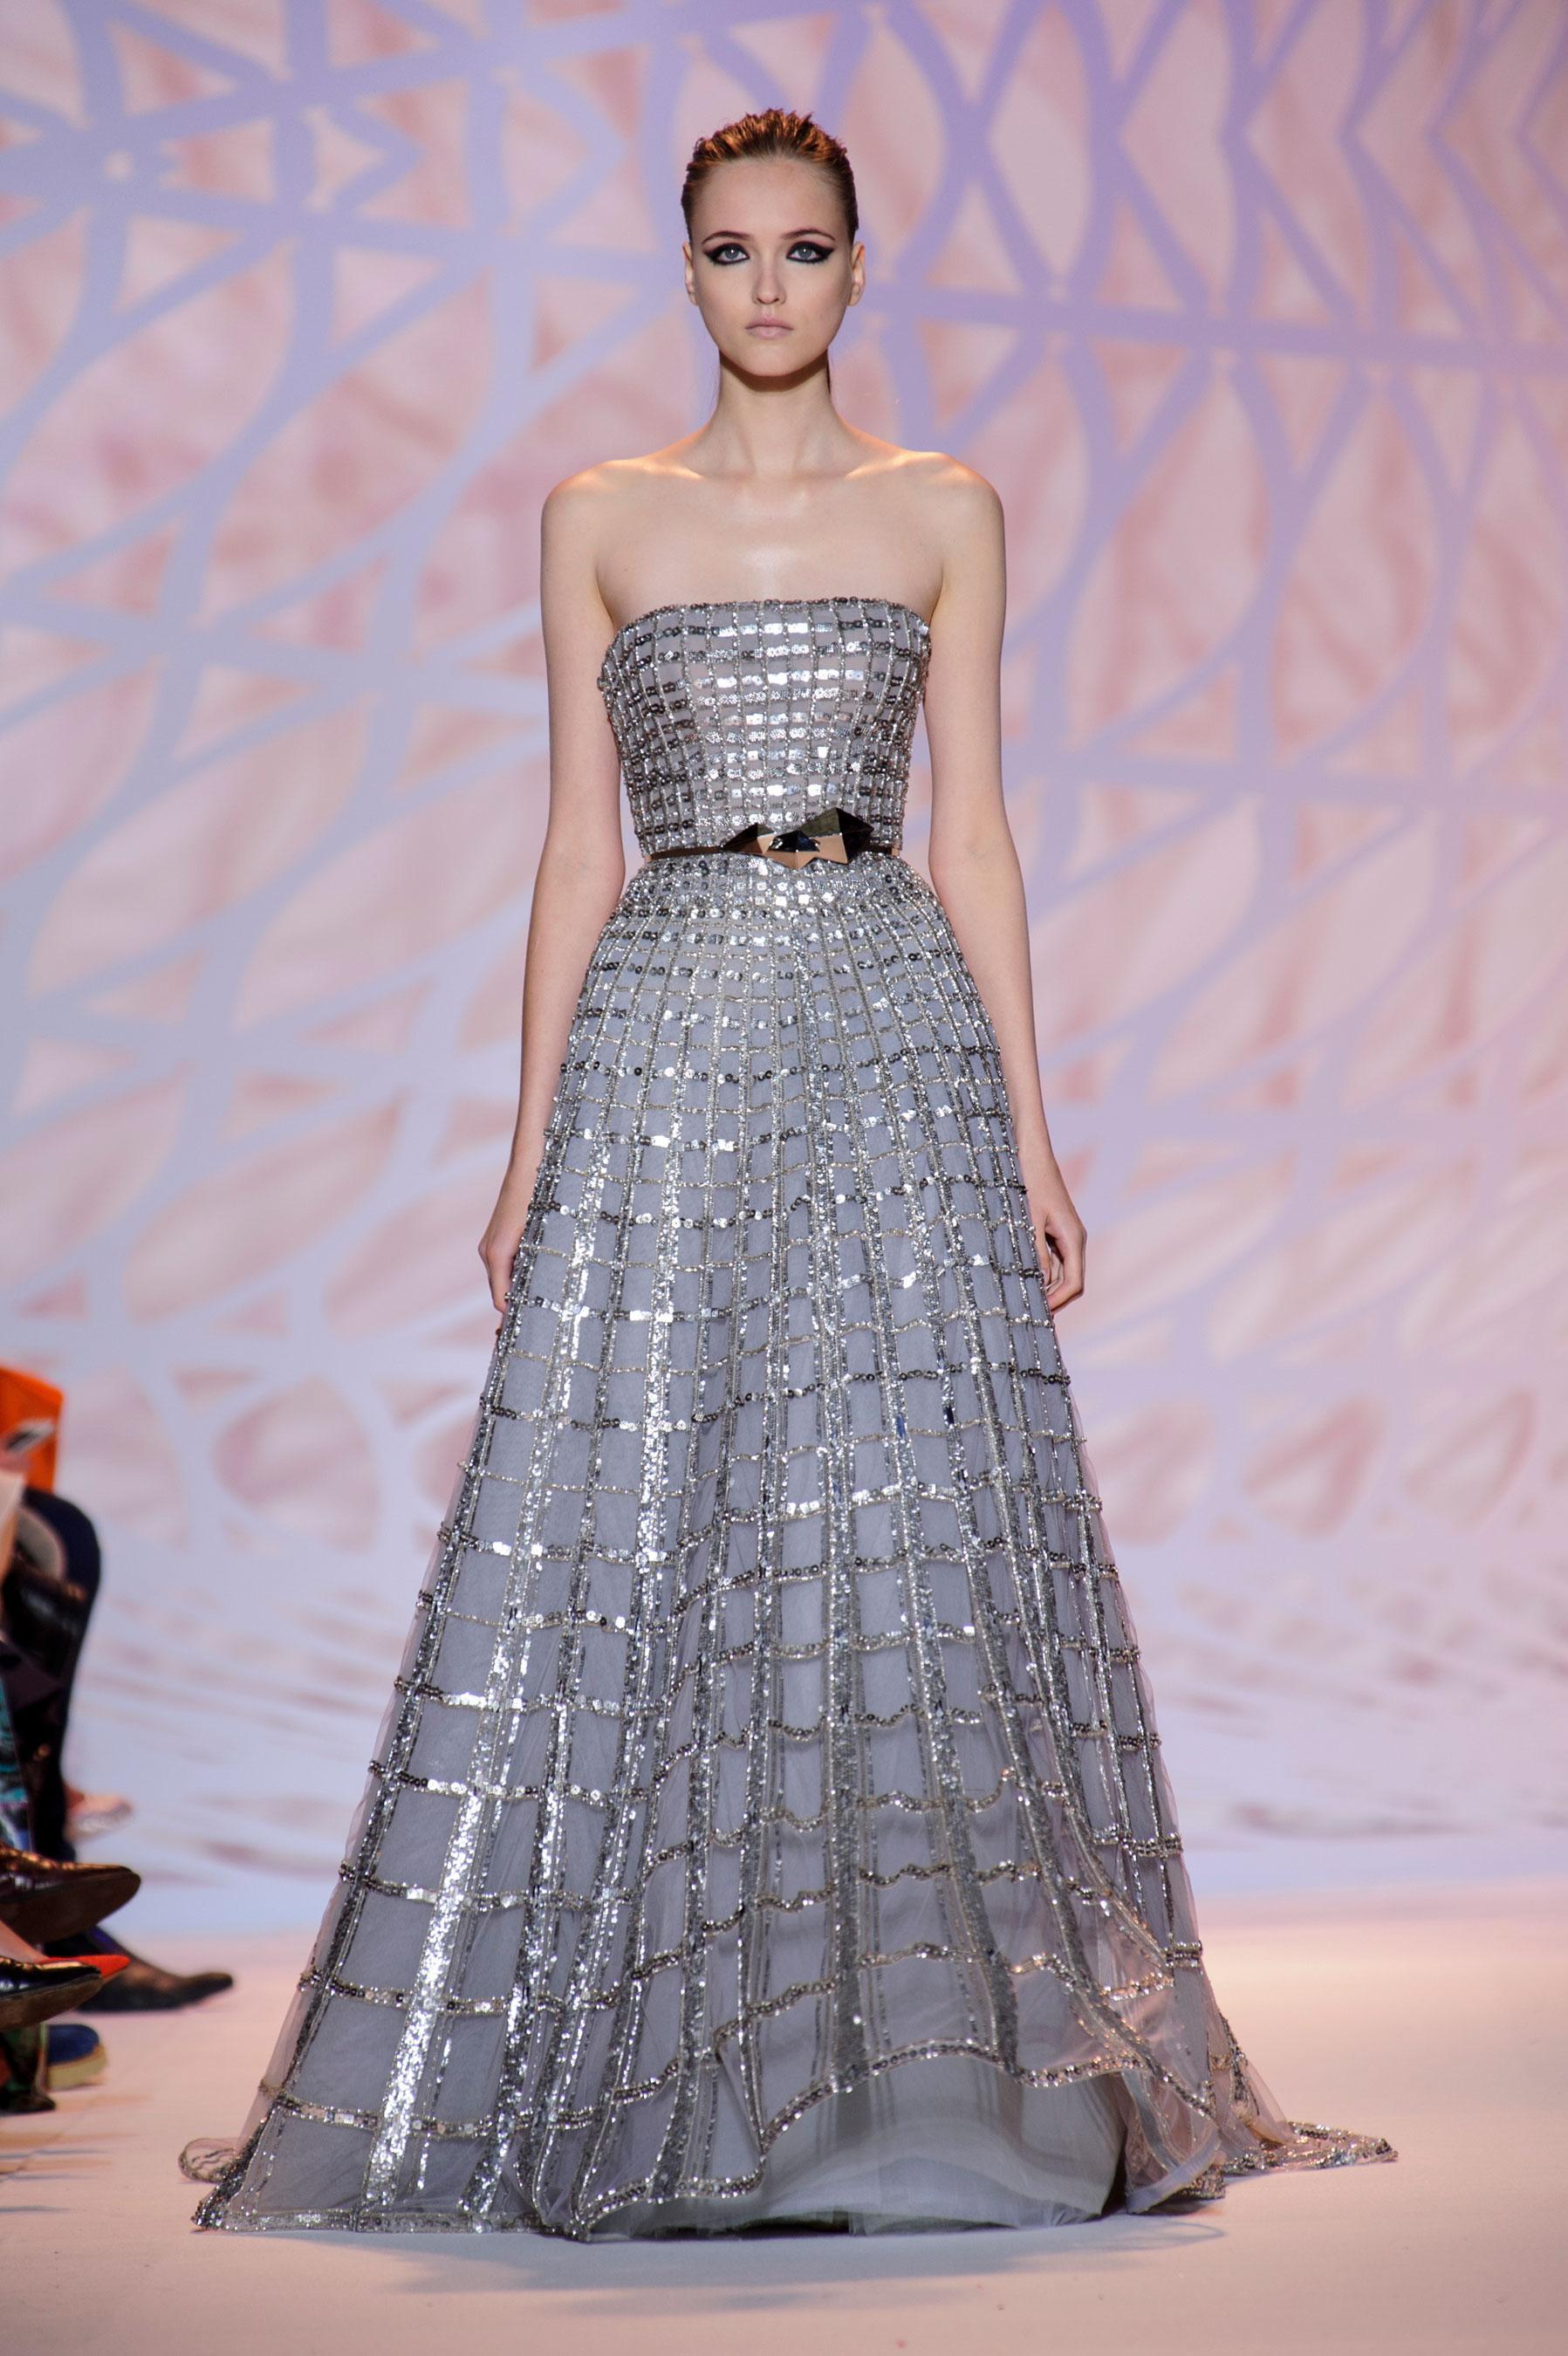 D fil zuhair murad automne hiver 2014 2015 haute couture for 1900 haute couture